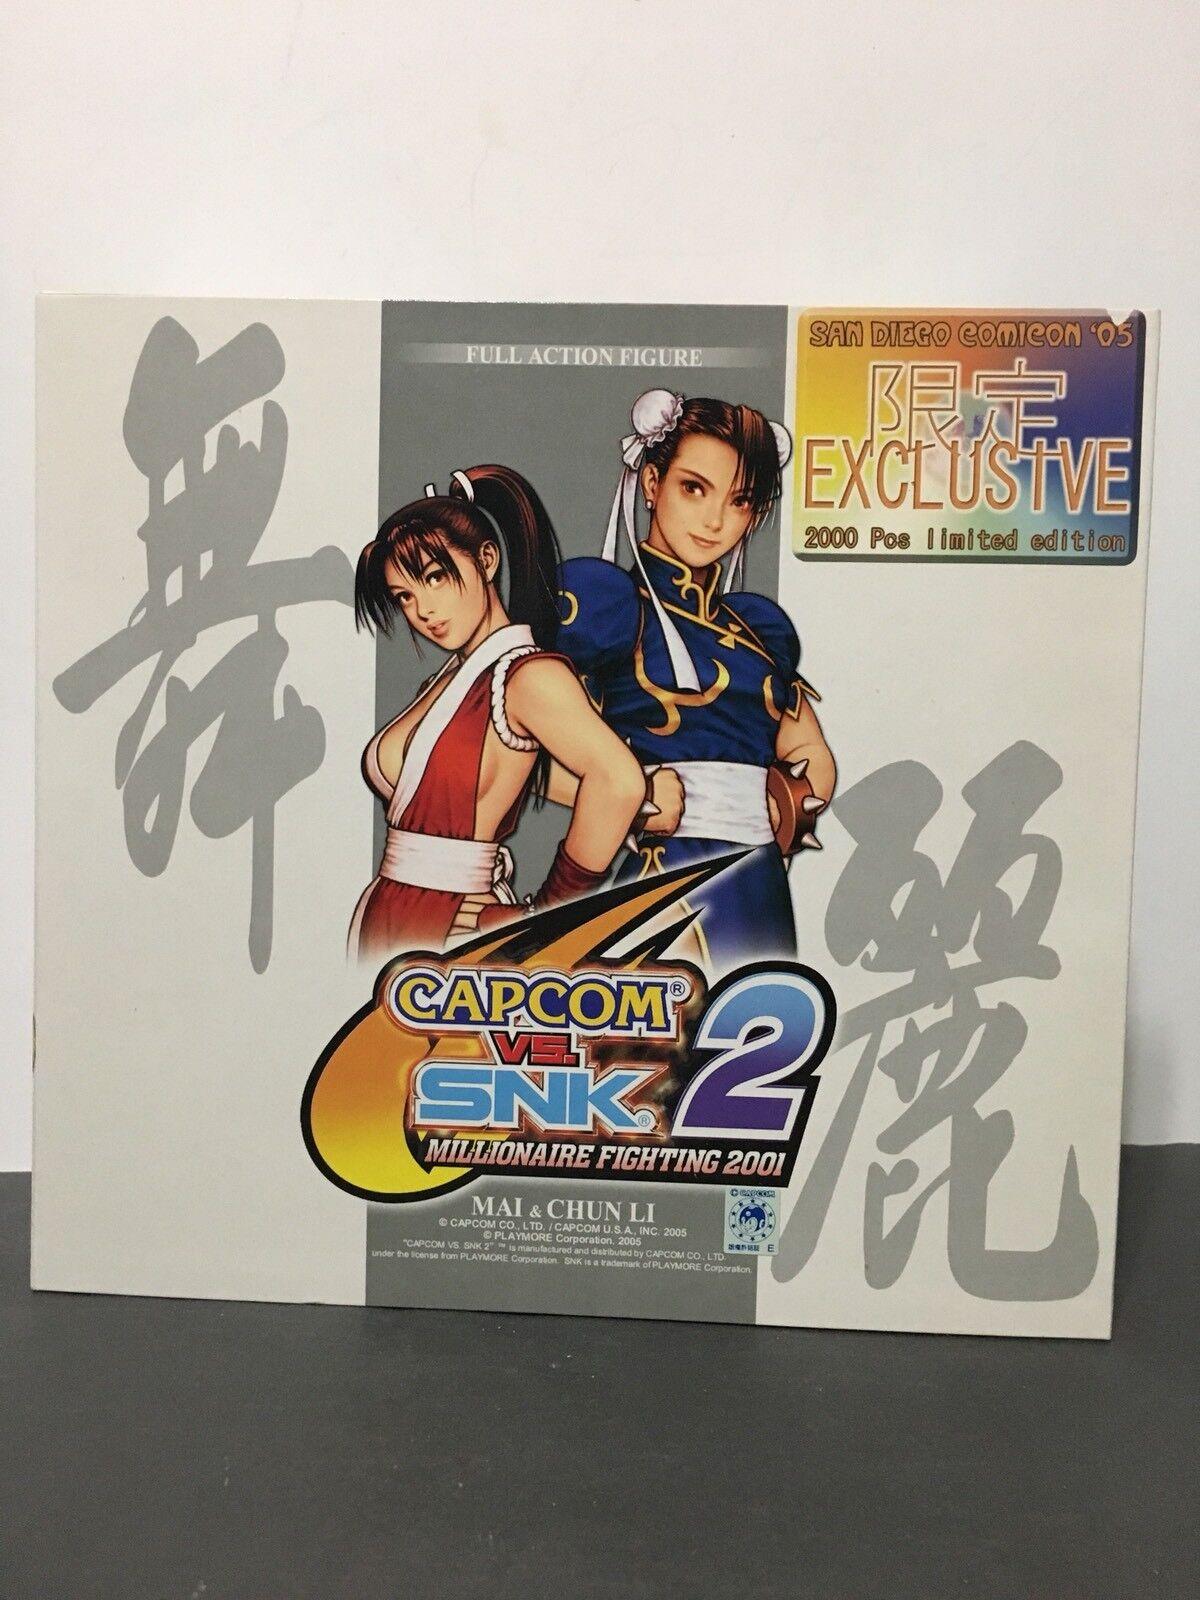 Capcom vs. SNK 2 Millionaire Fighting 2001 SDCC '05 Exclusive Mai & Chun Li Set